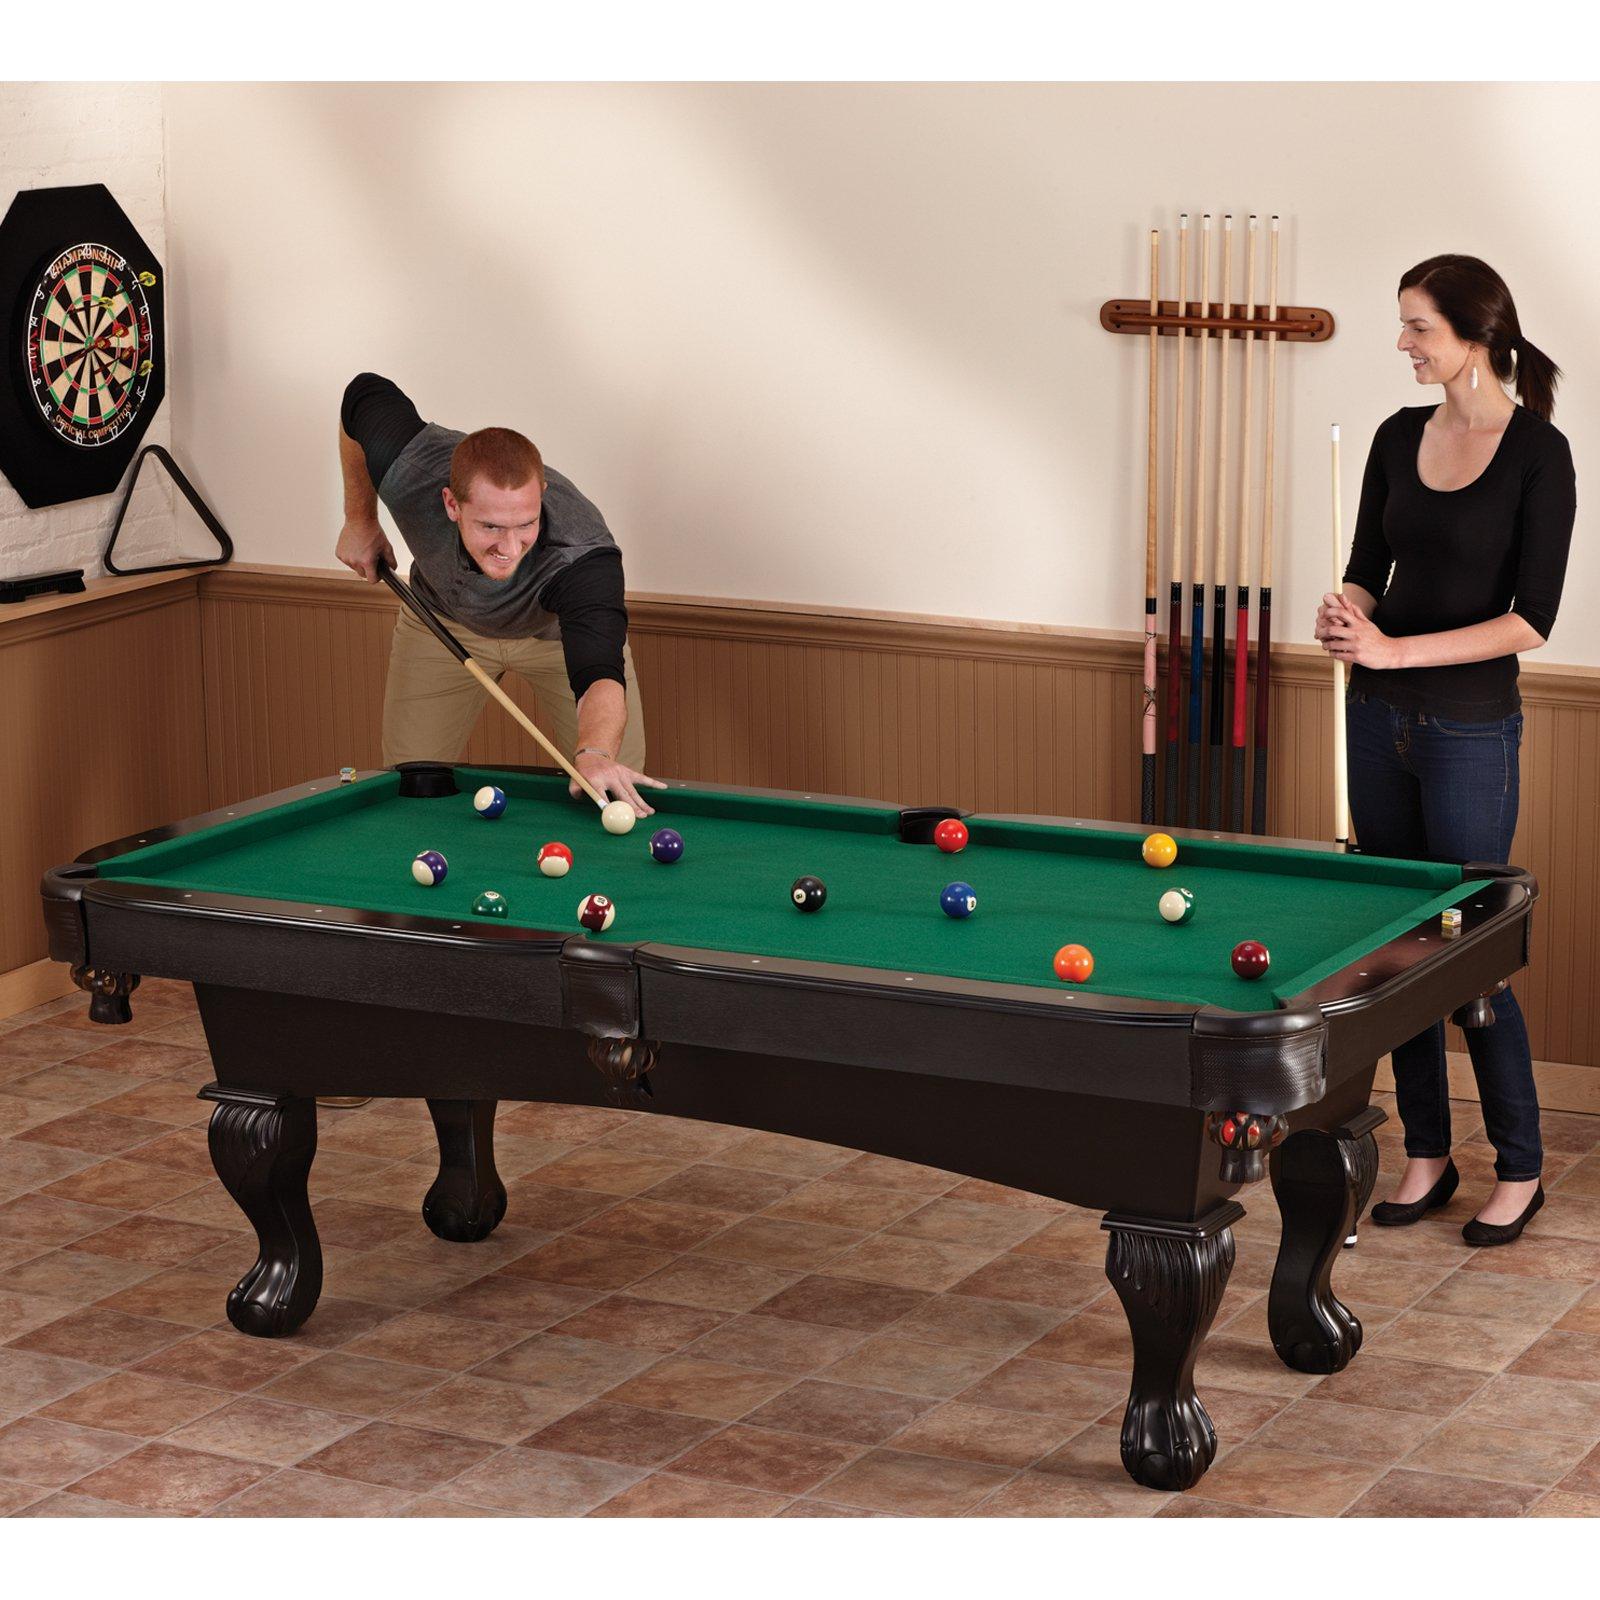 6 Foot Pool Table for Sale | 5 Foot Pool Tables | Mizerak Pool Table